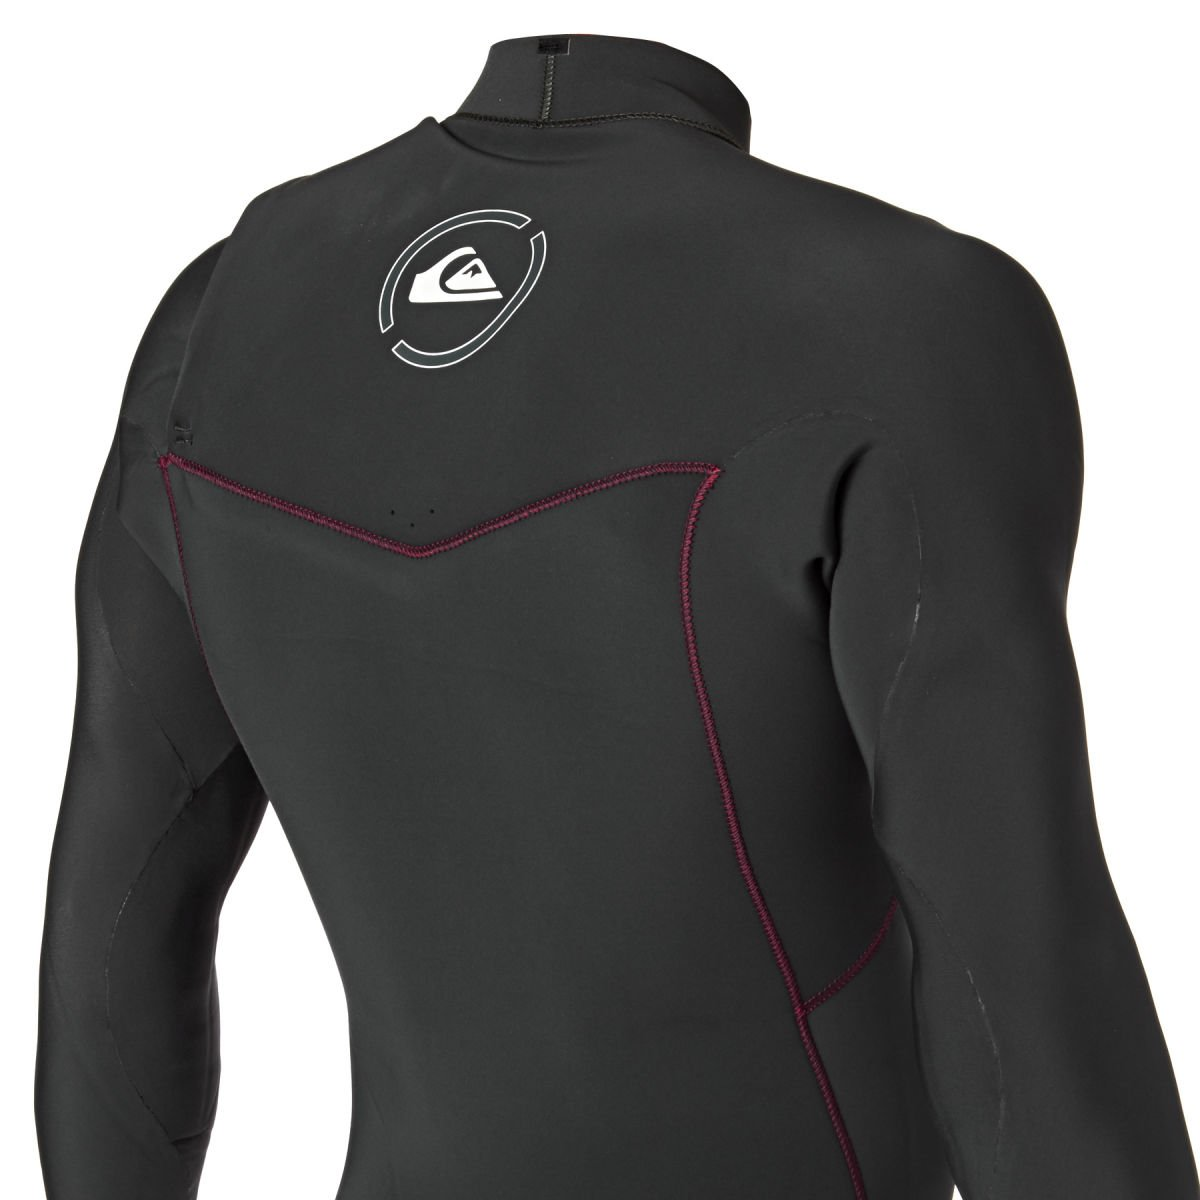 Quiksilver AG47 Zipperless 3/2mm - Wetsuit - Traje de surf ...